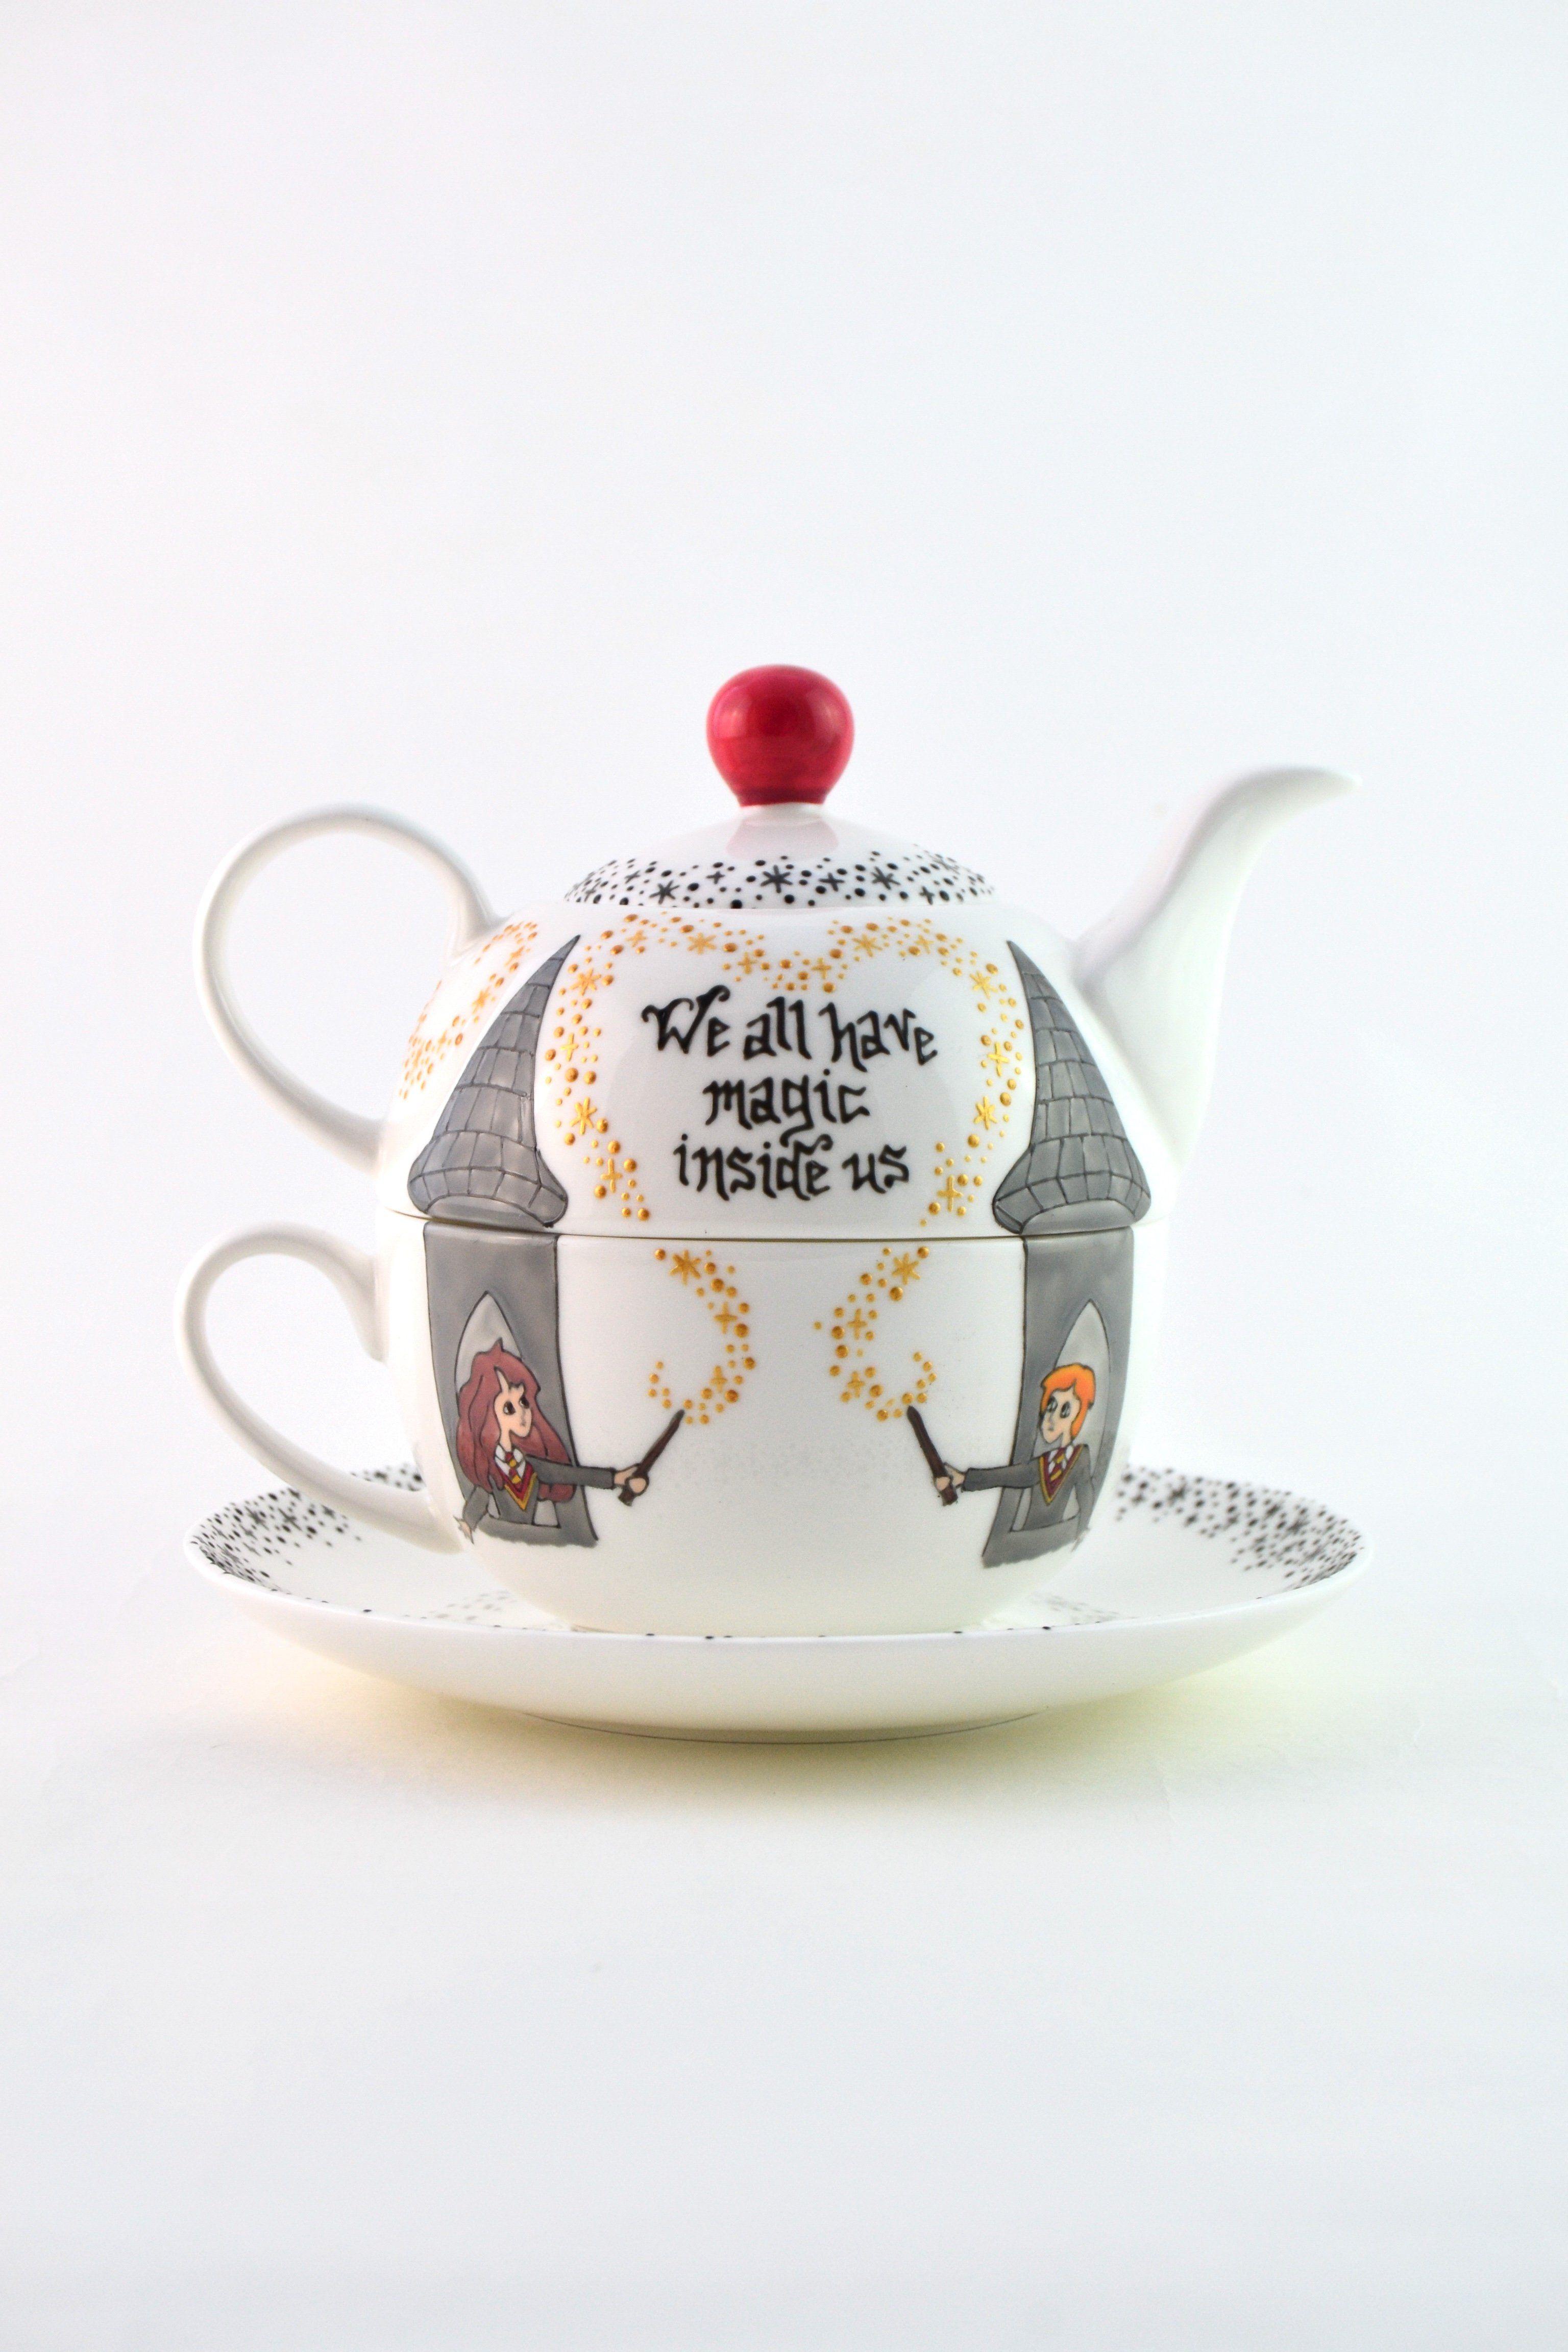 Harry potter tea set for one in 2020 harry potter decor